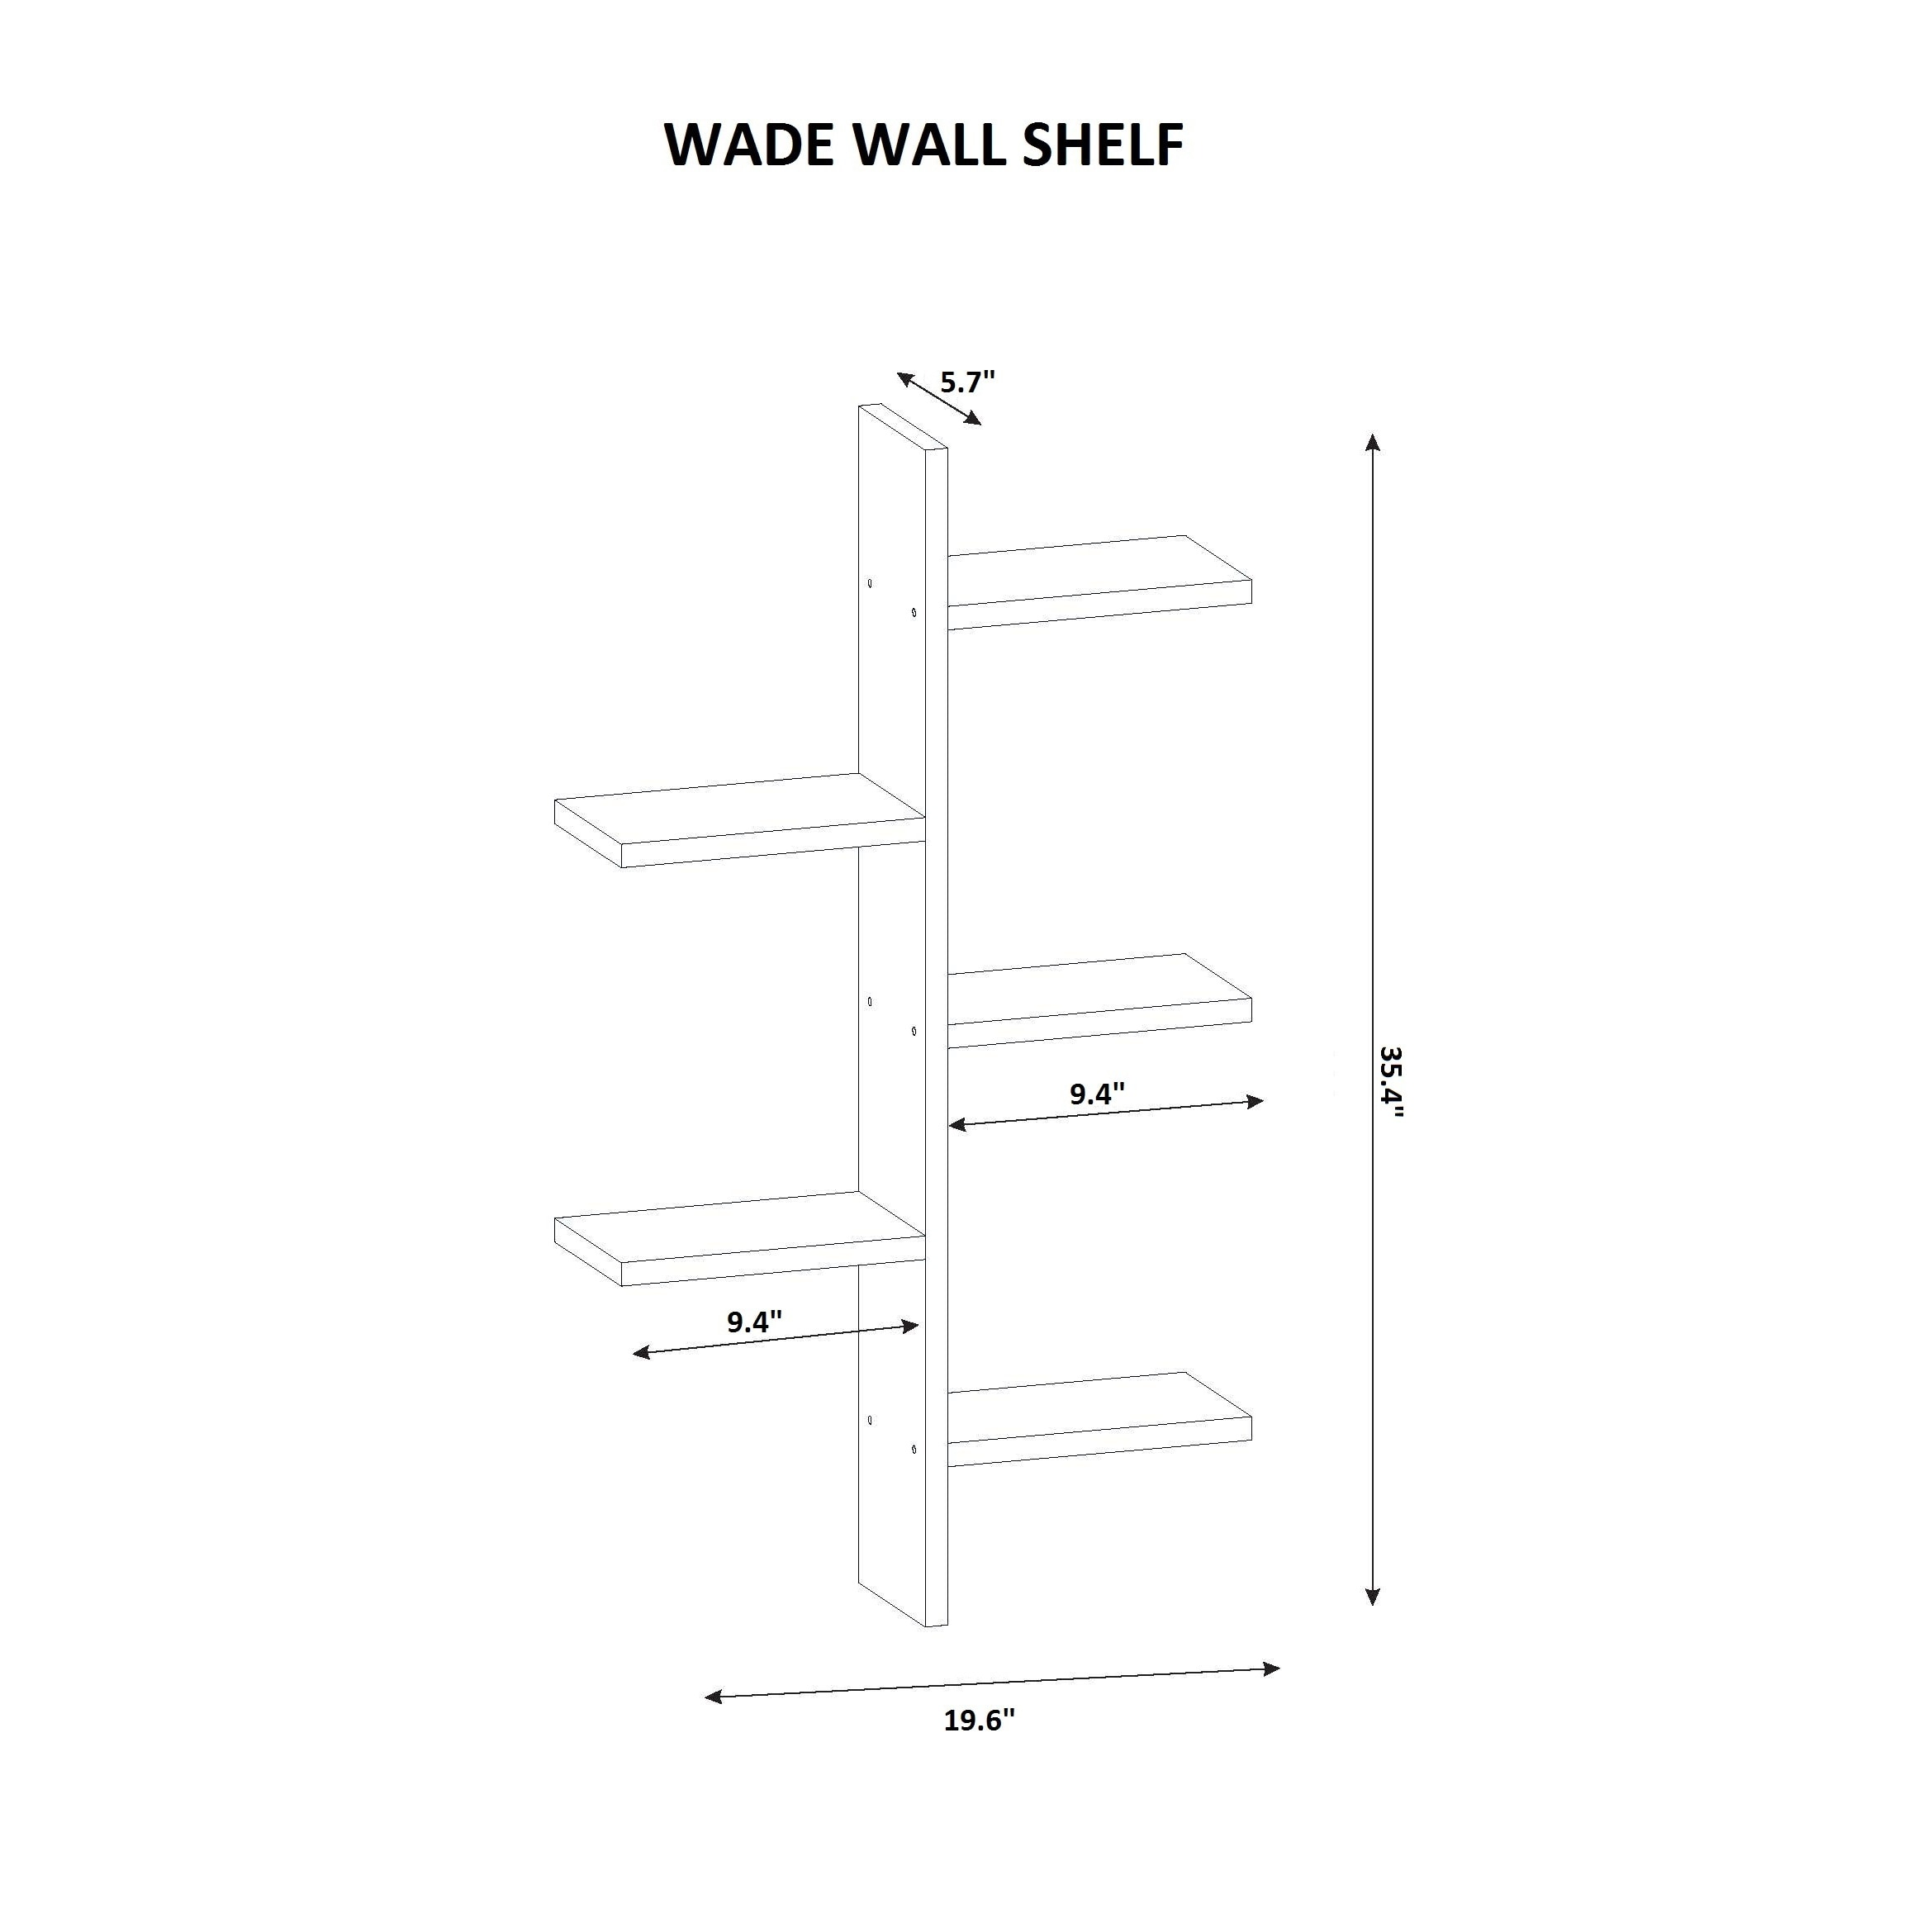 Wade 20 x 35 x 6 modern minimalist wall shelf free shipping wade 20 x 35 x 6 modern minimalist wall shelf free shipping today overstock 21568921 ccuart Images